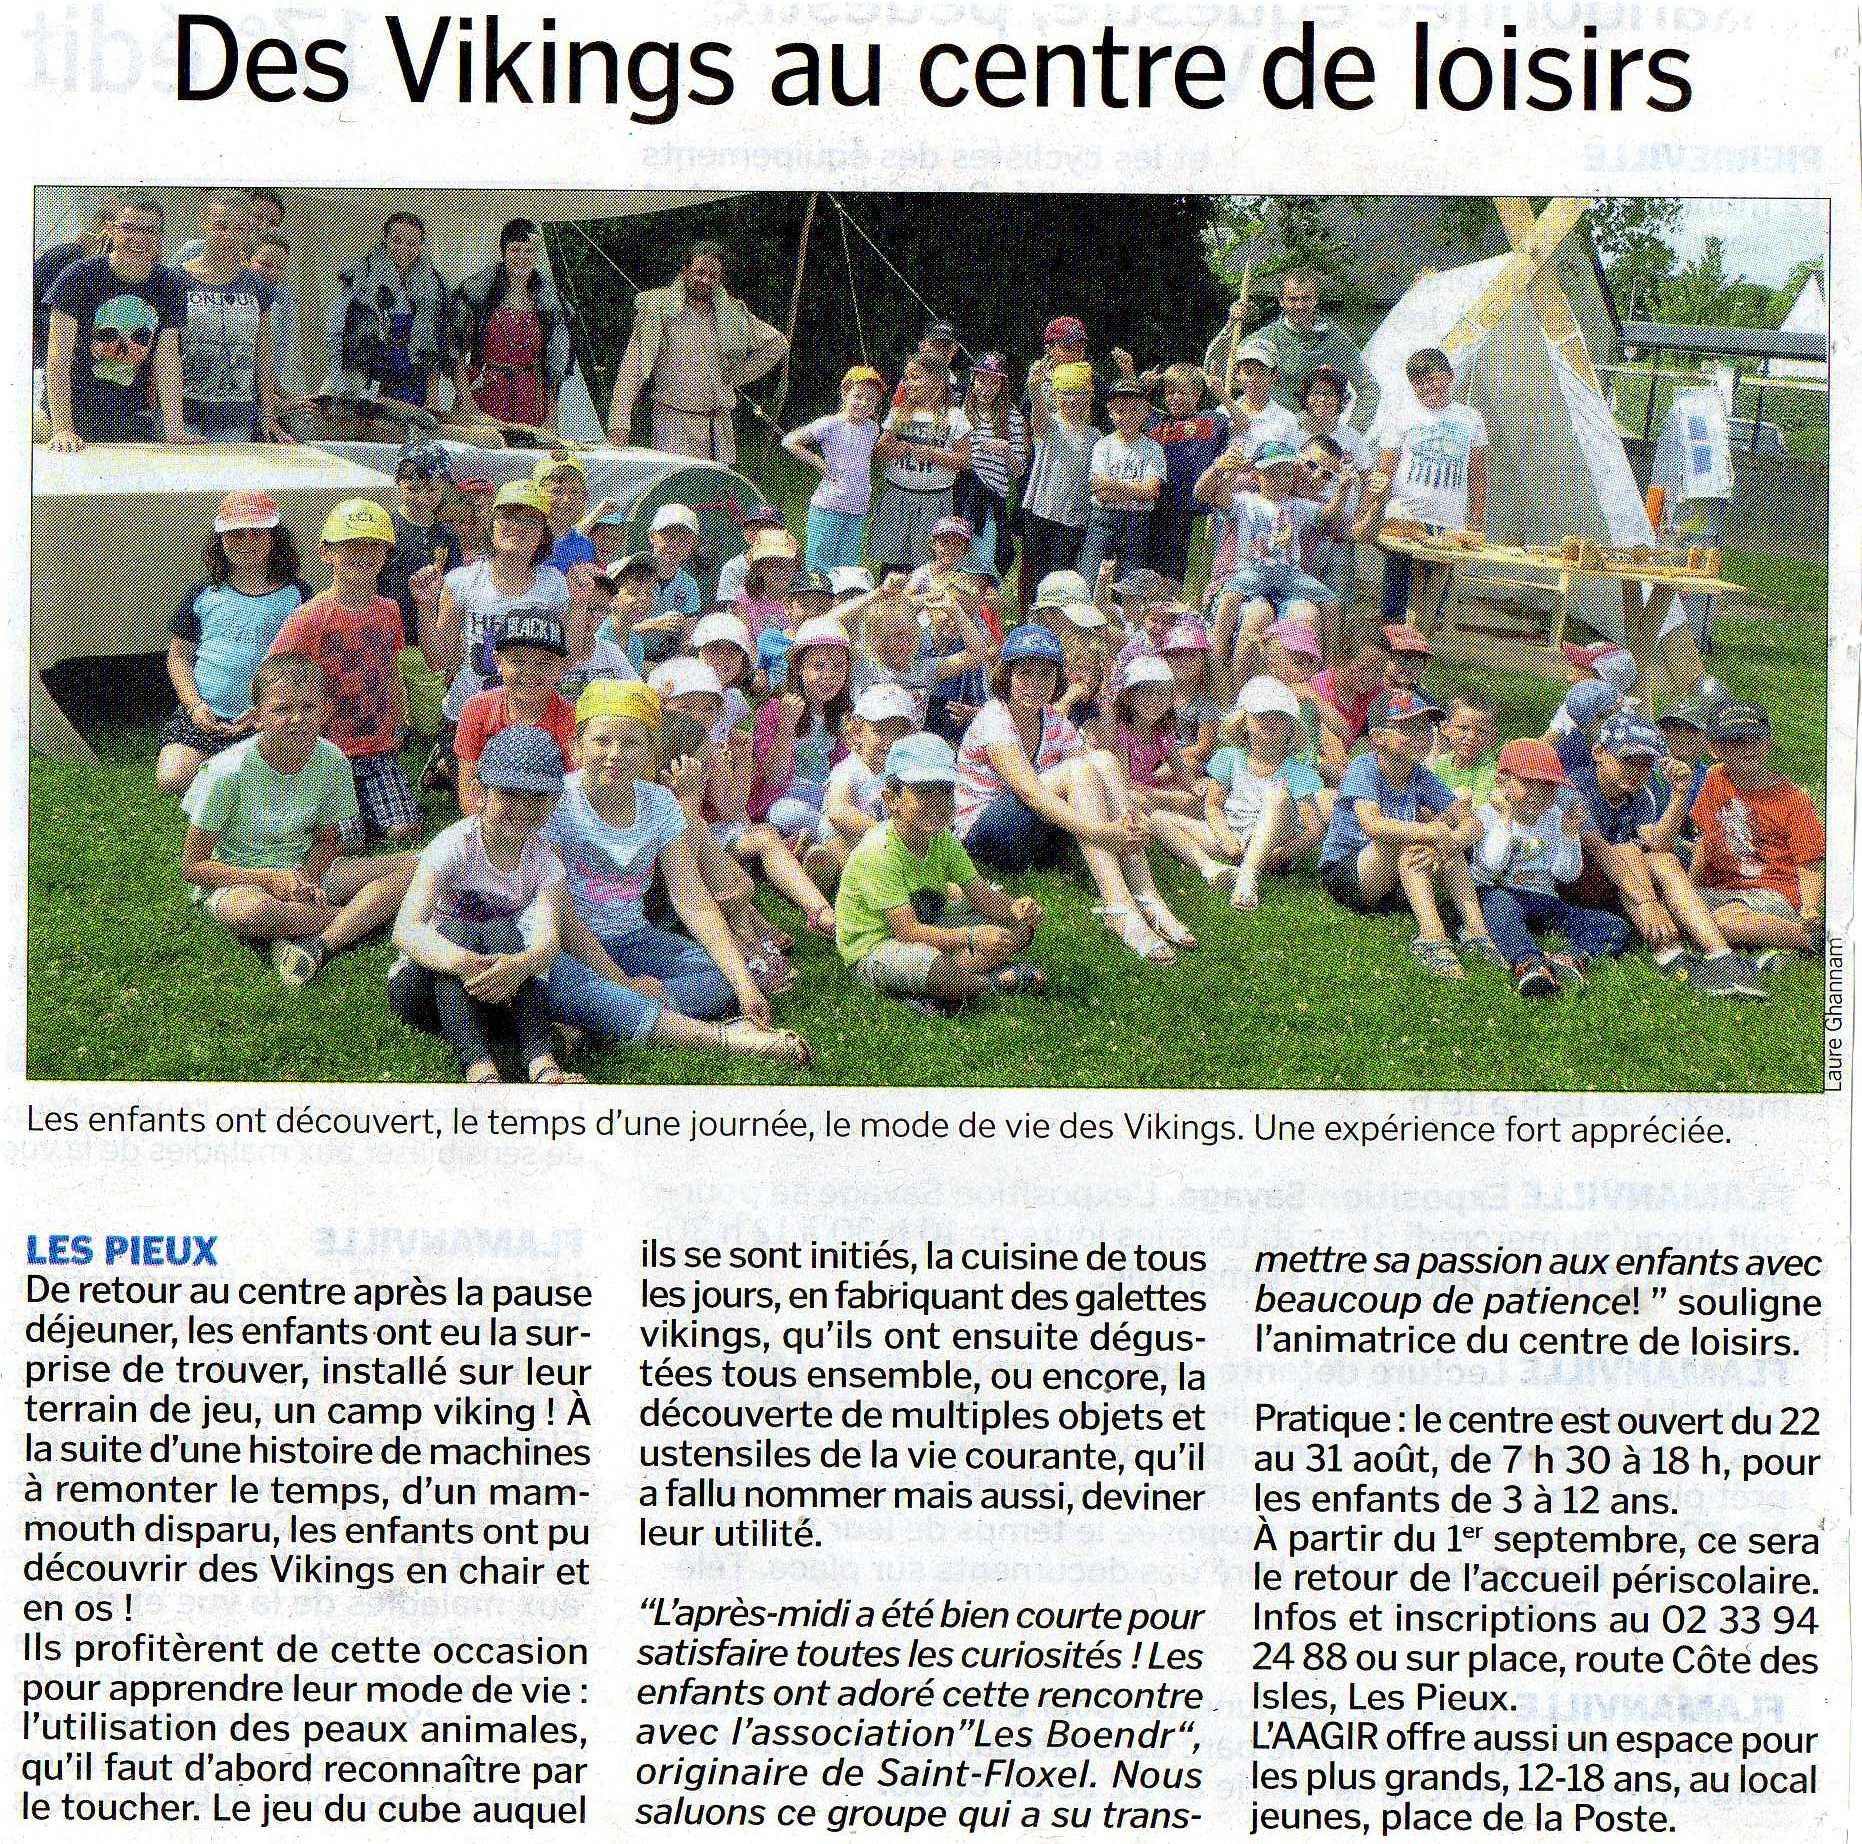 La Presse de la Manche - 27/08/2016